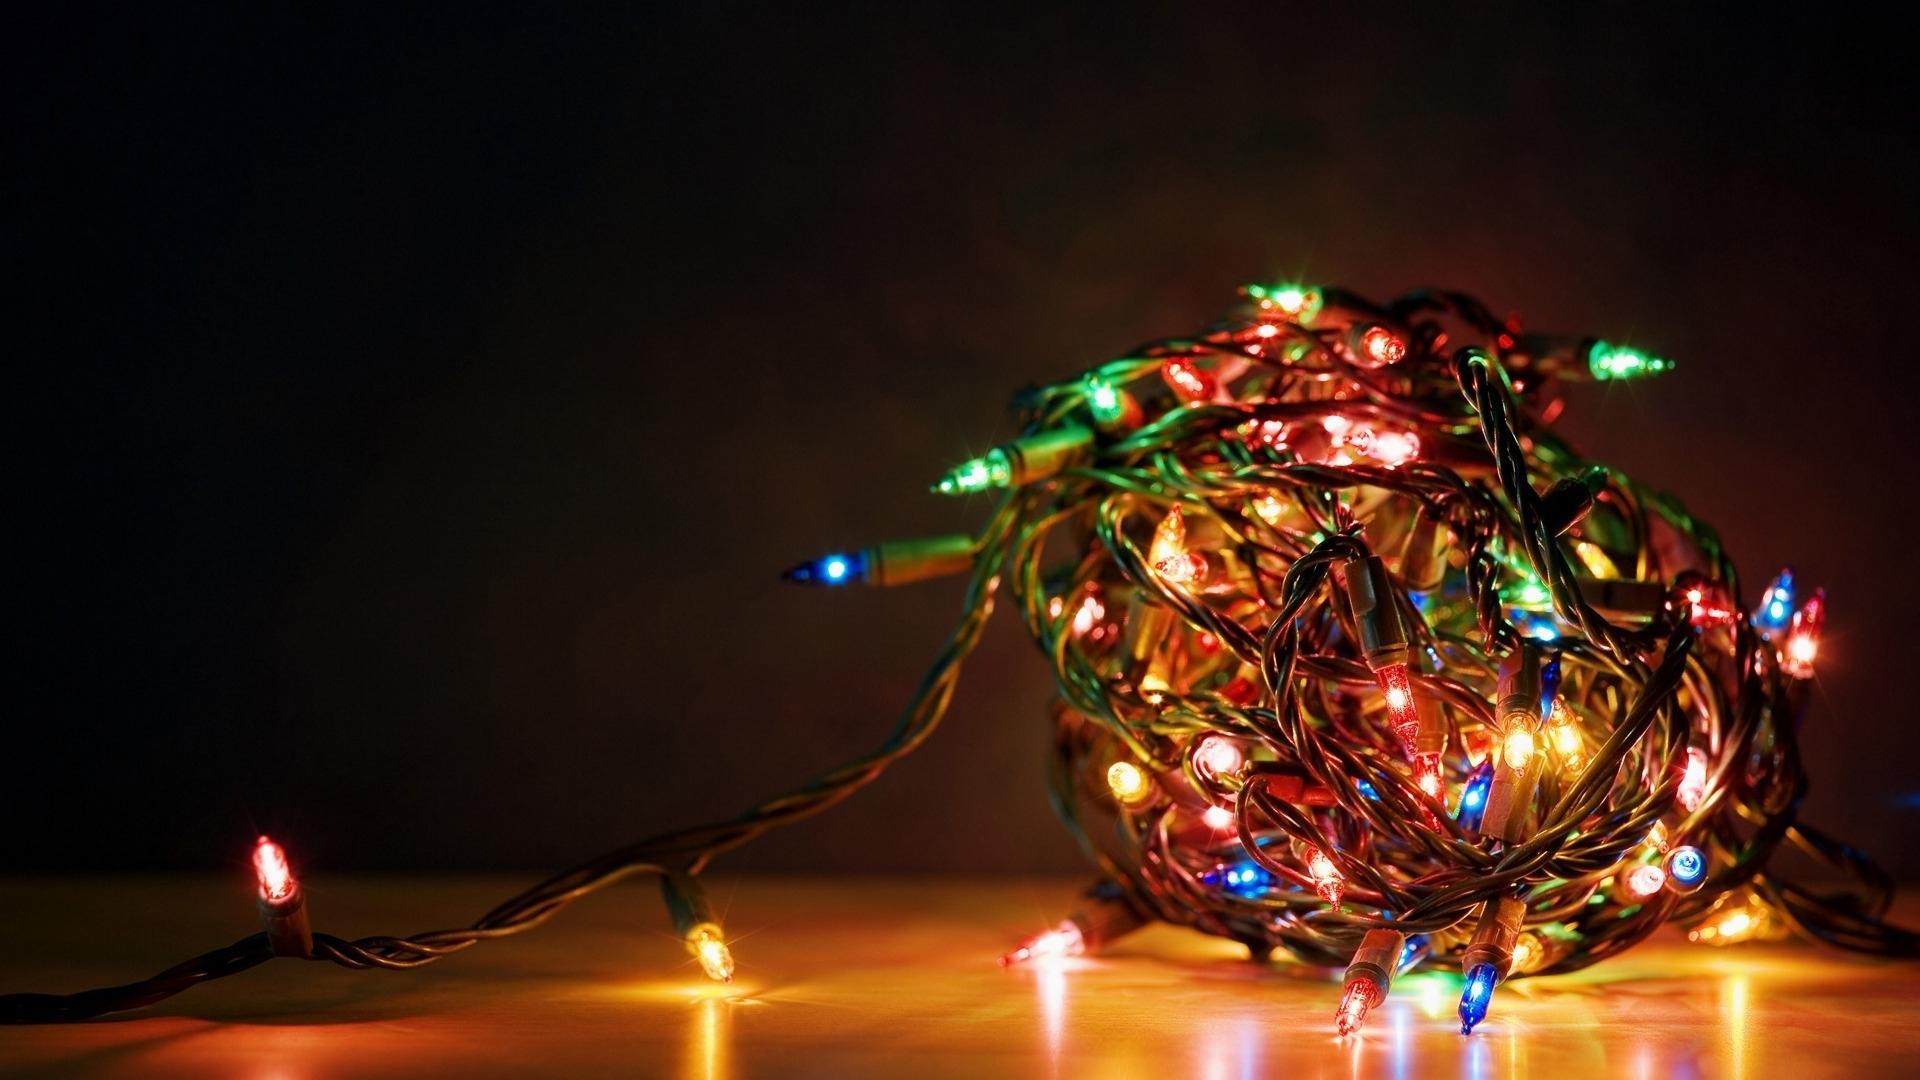 christmas lights wallpapers. - media file | pixelstalk